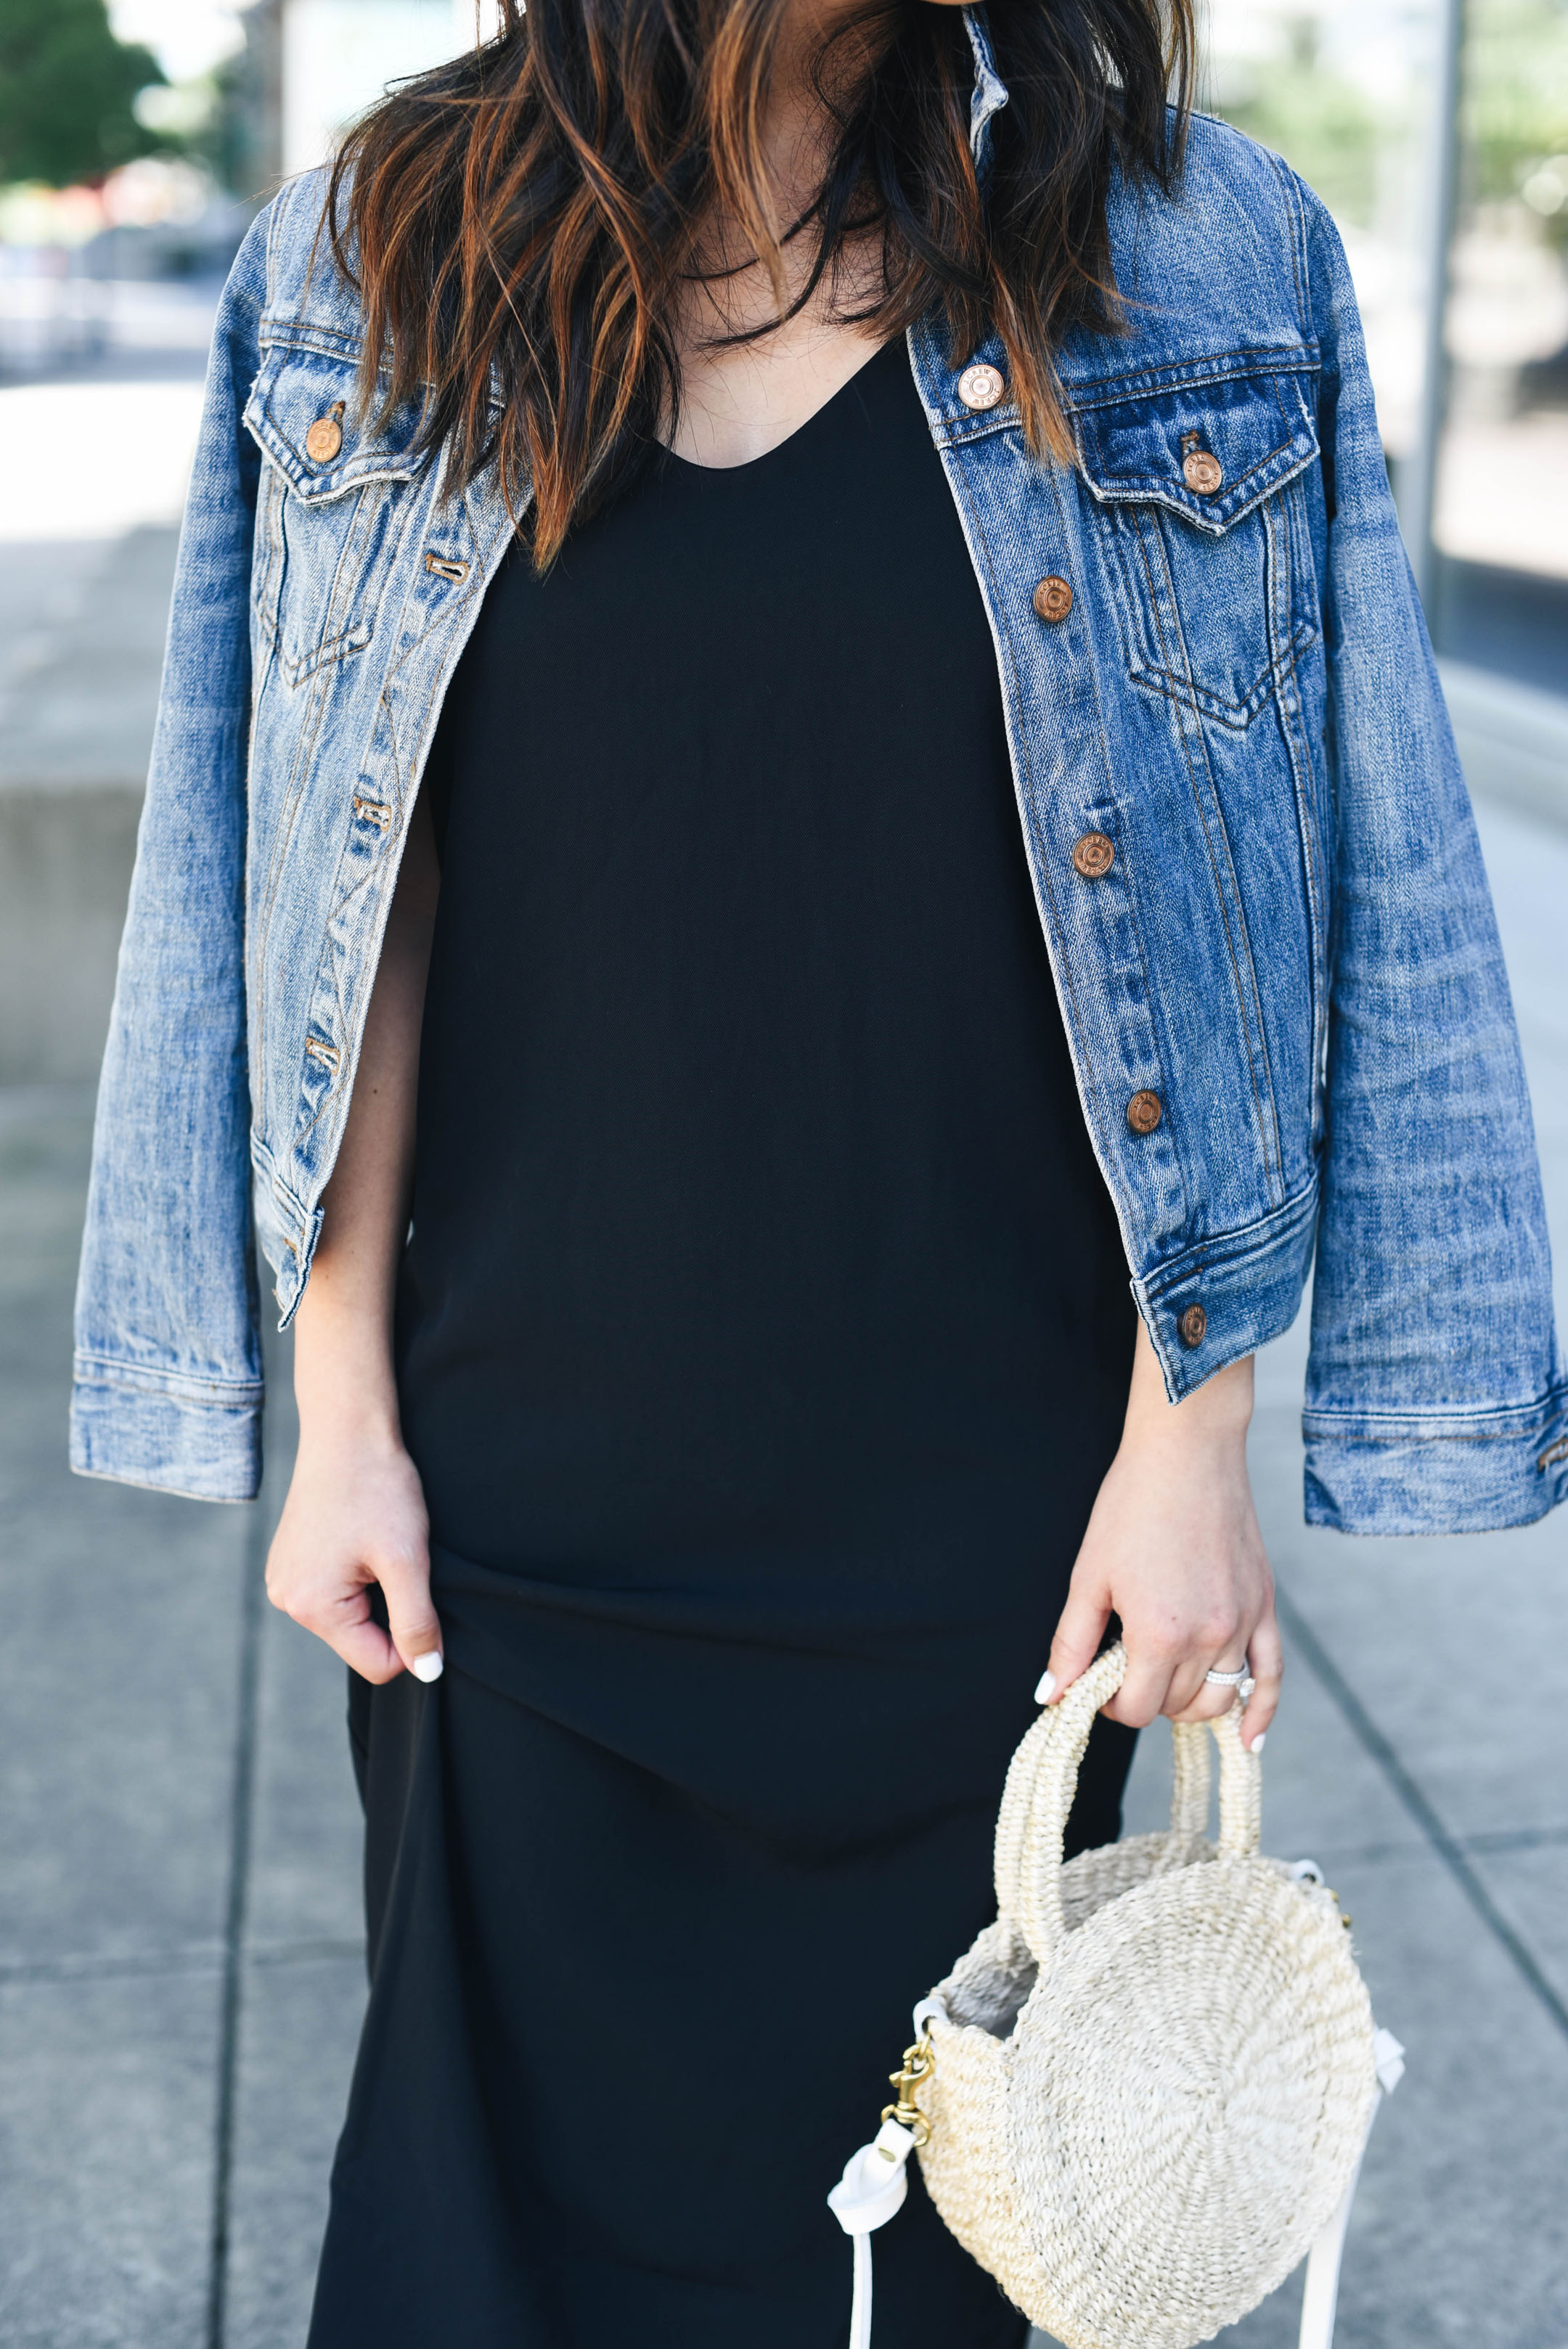 Everlane black slip dress